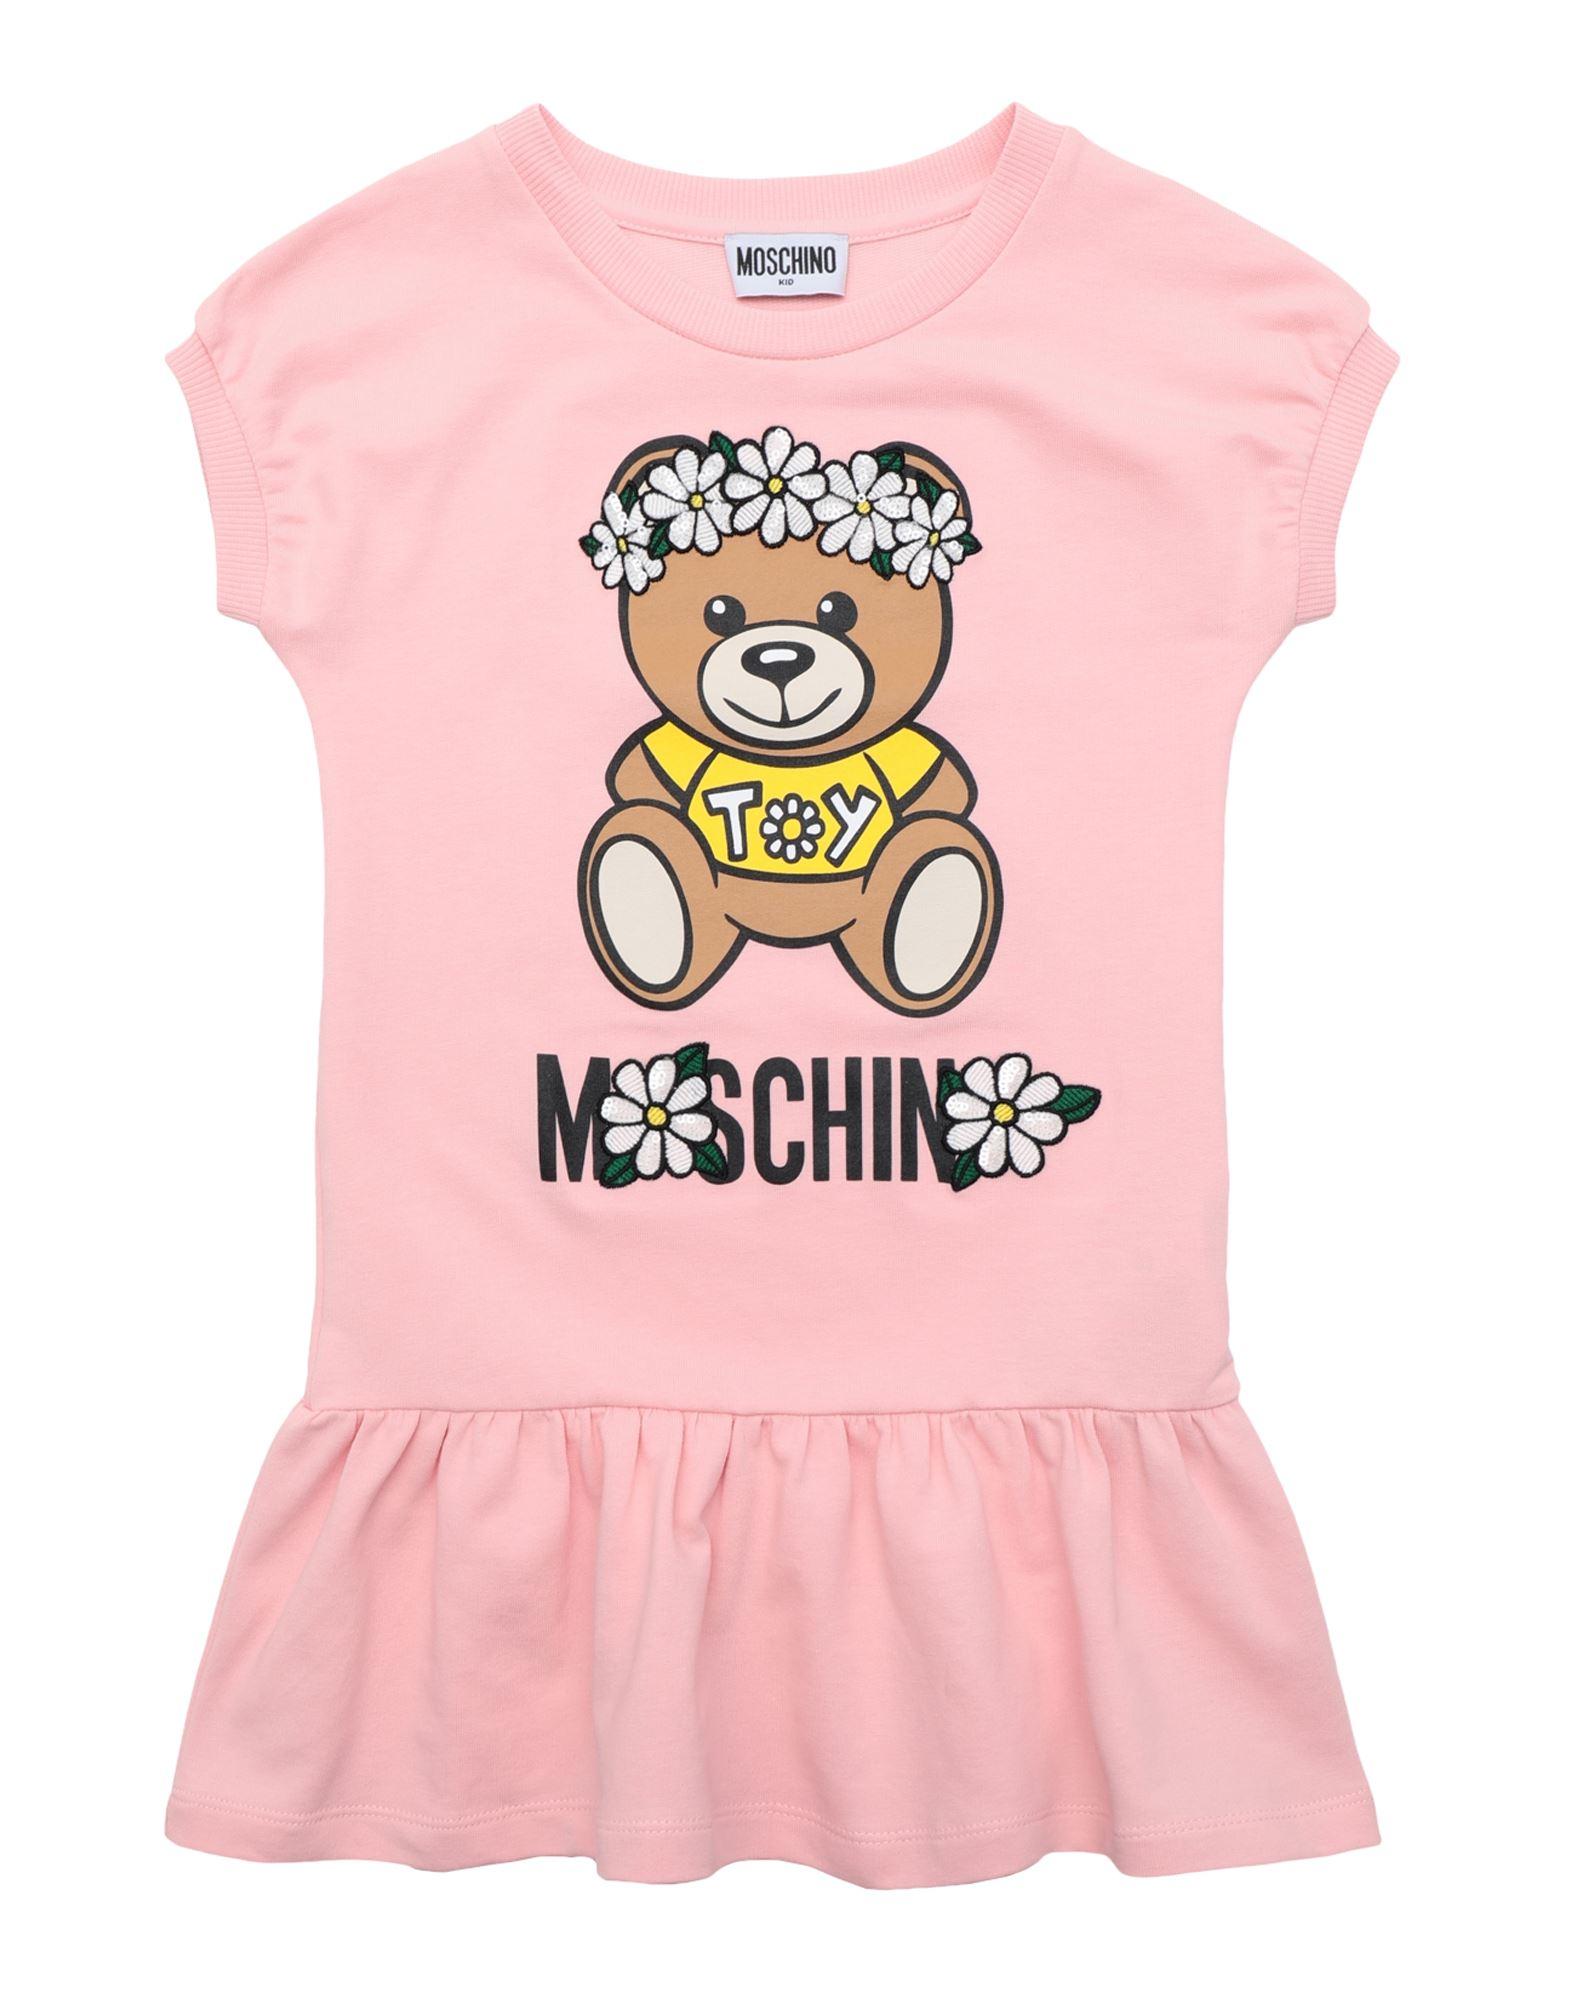 MOSCHINO KID Dresses - Item 15111270